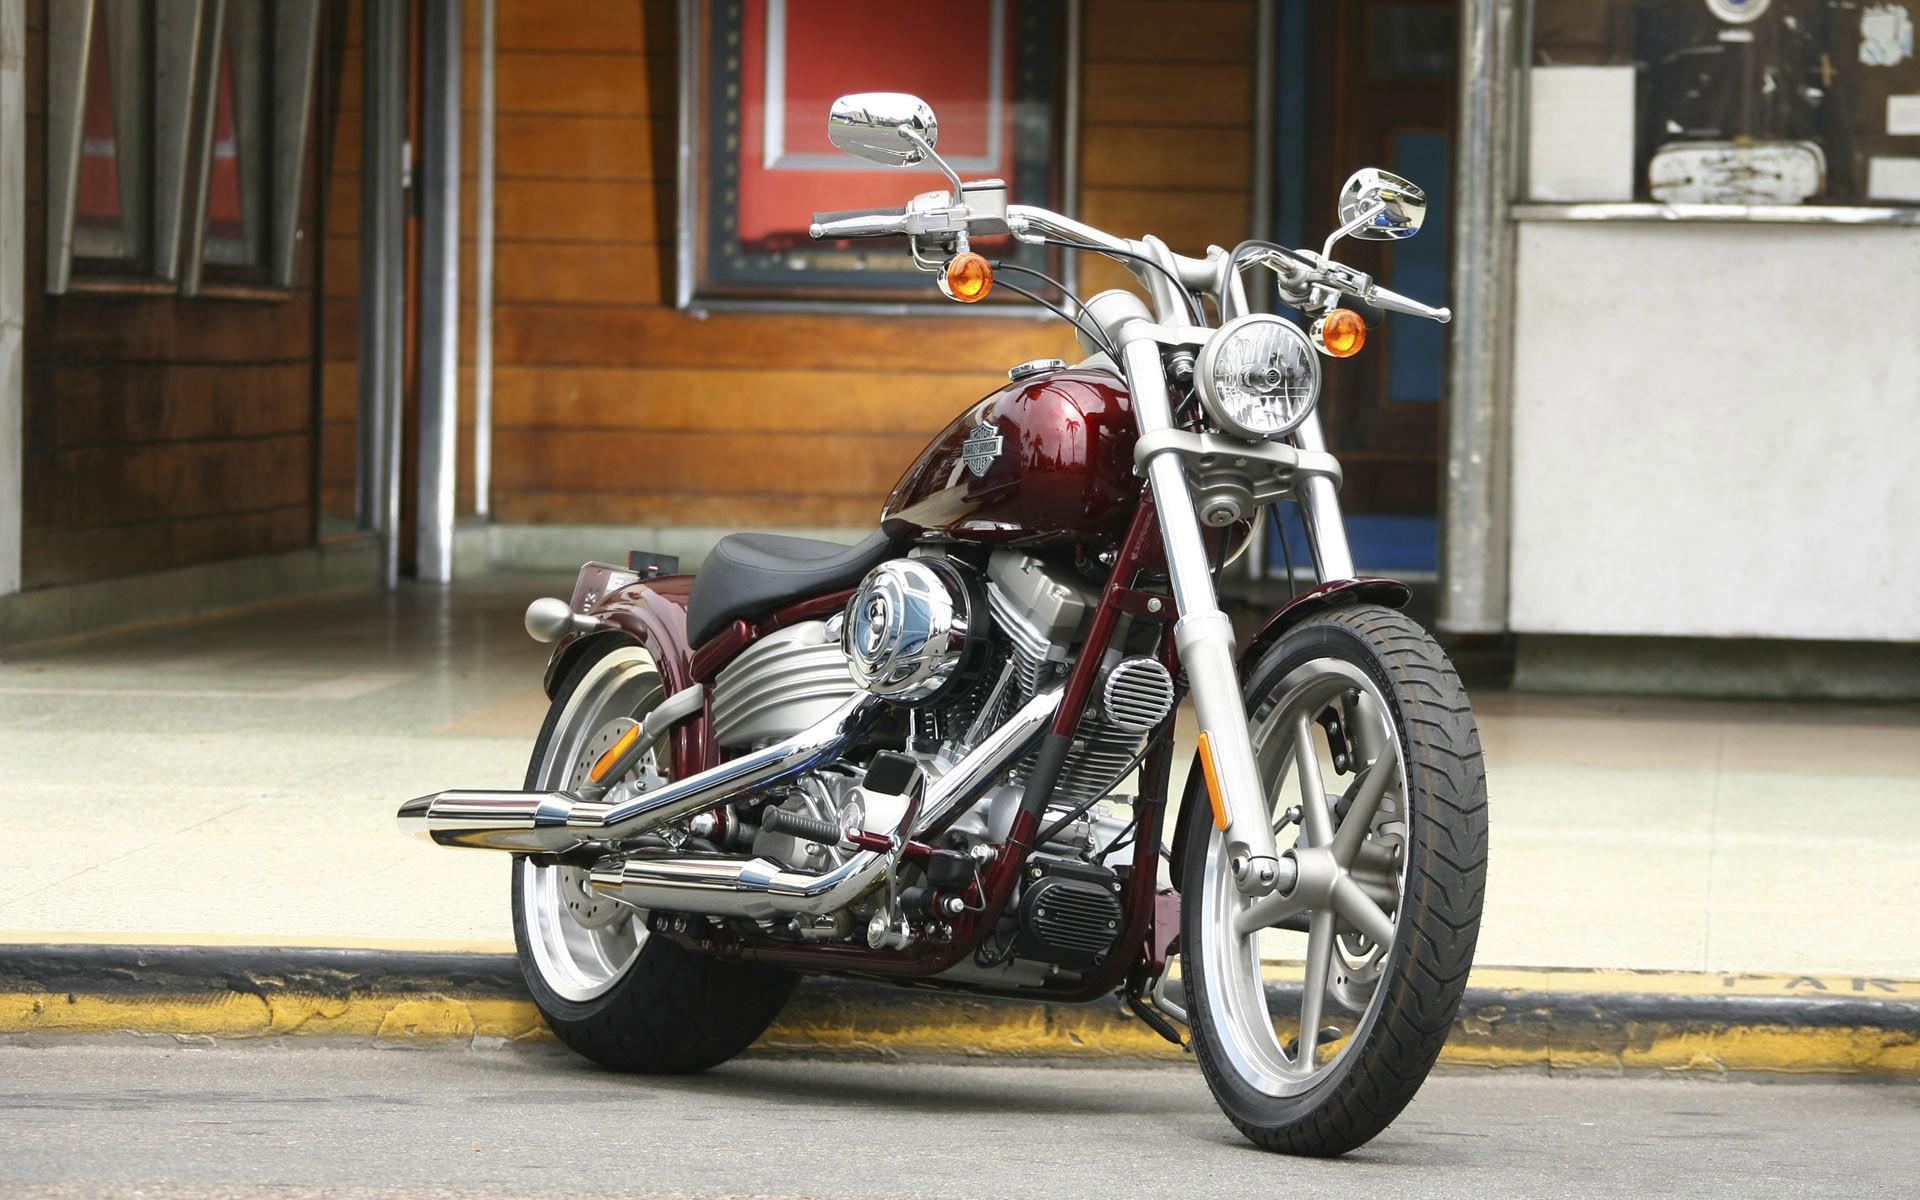 Moto Harley Davidson - 1920x1200